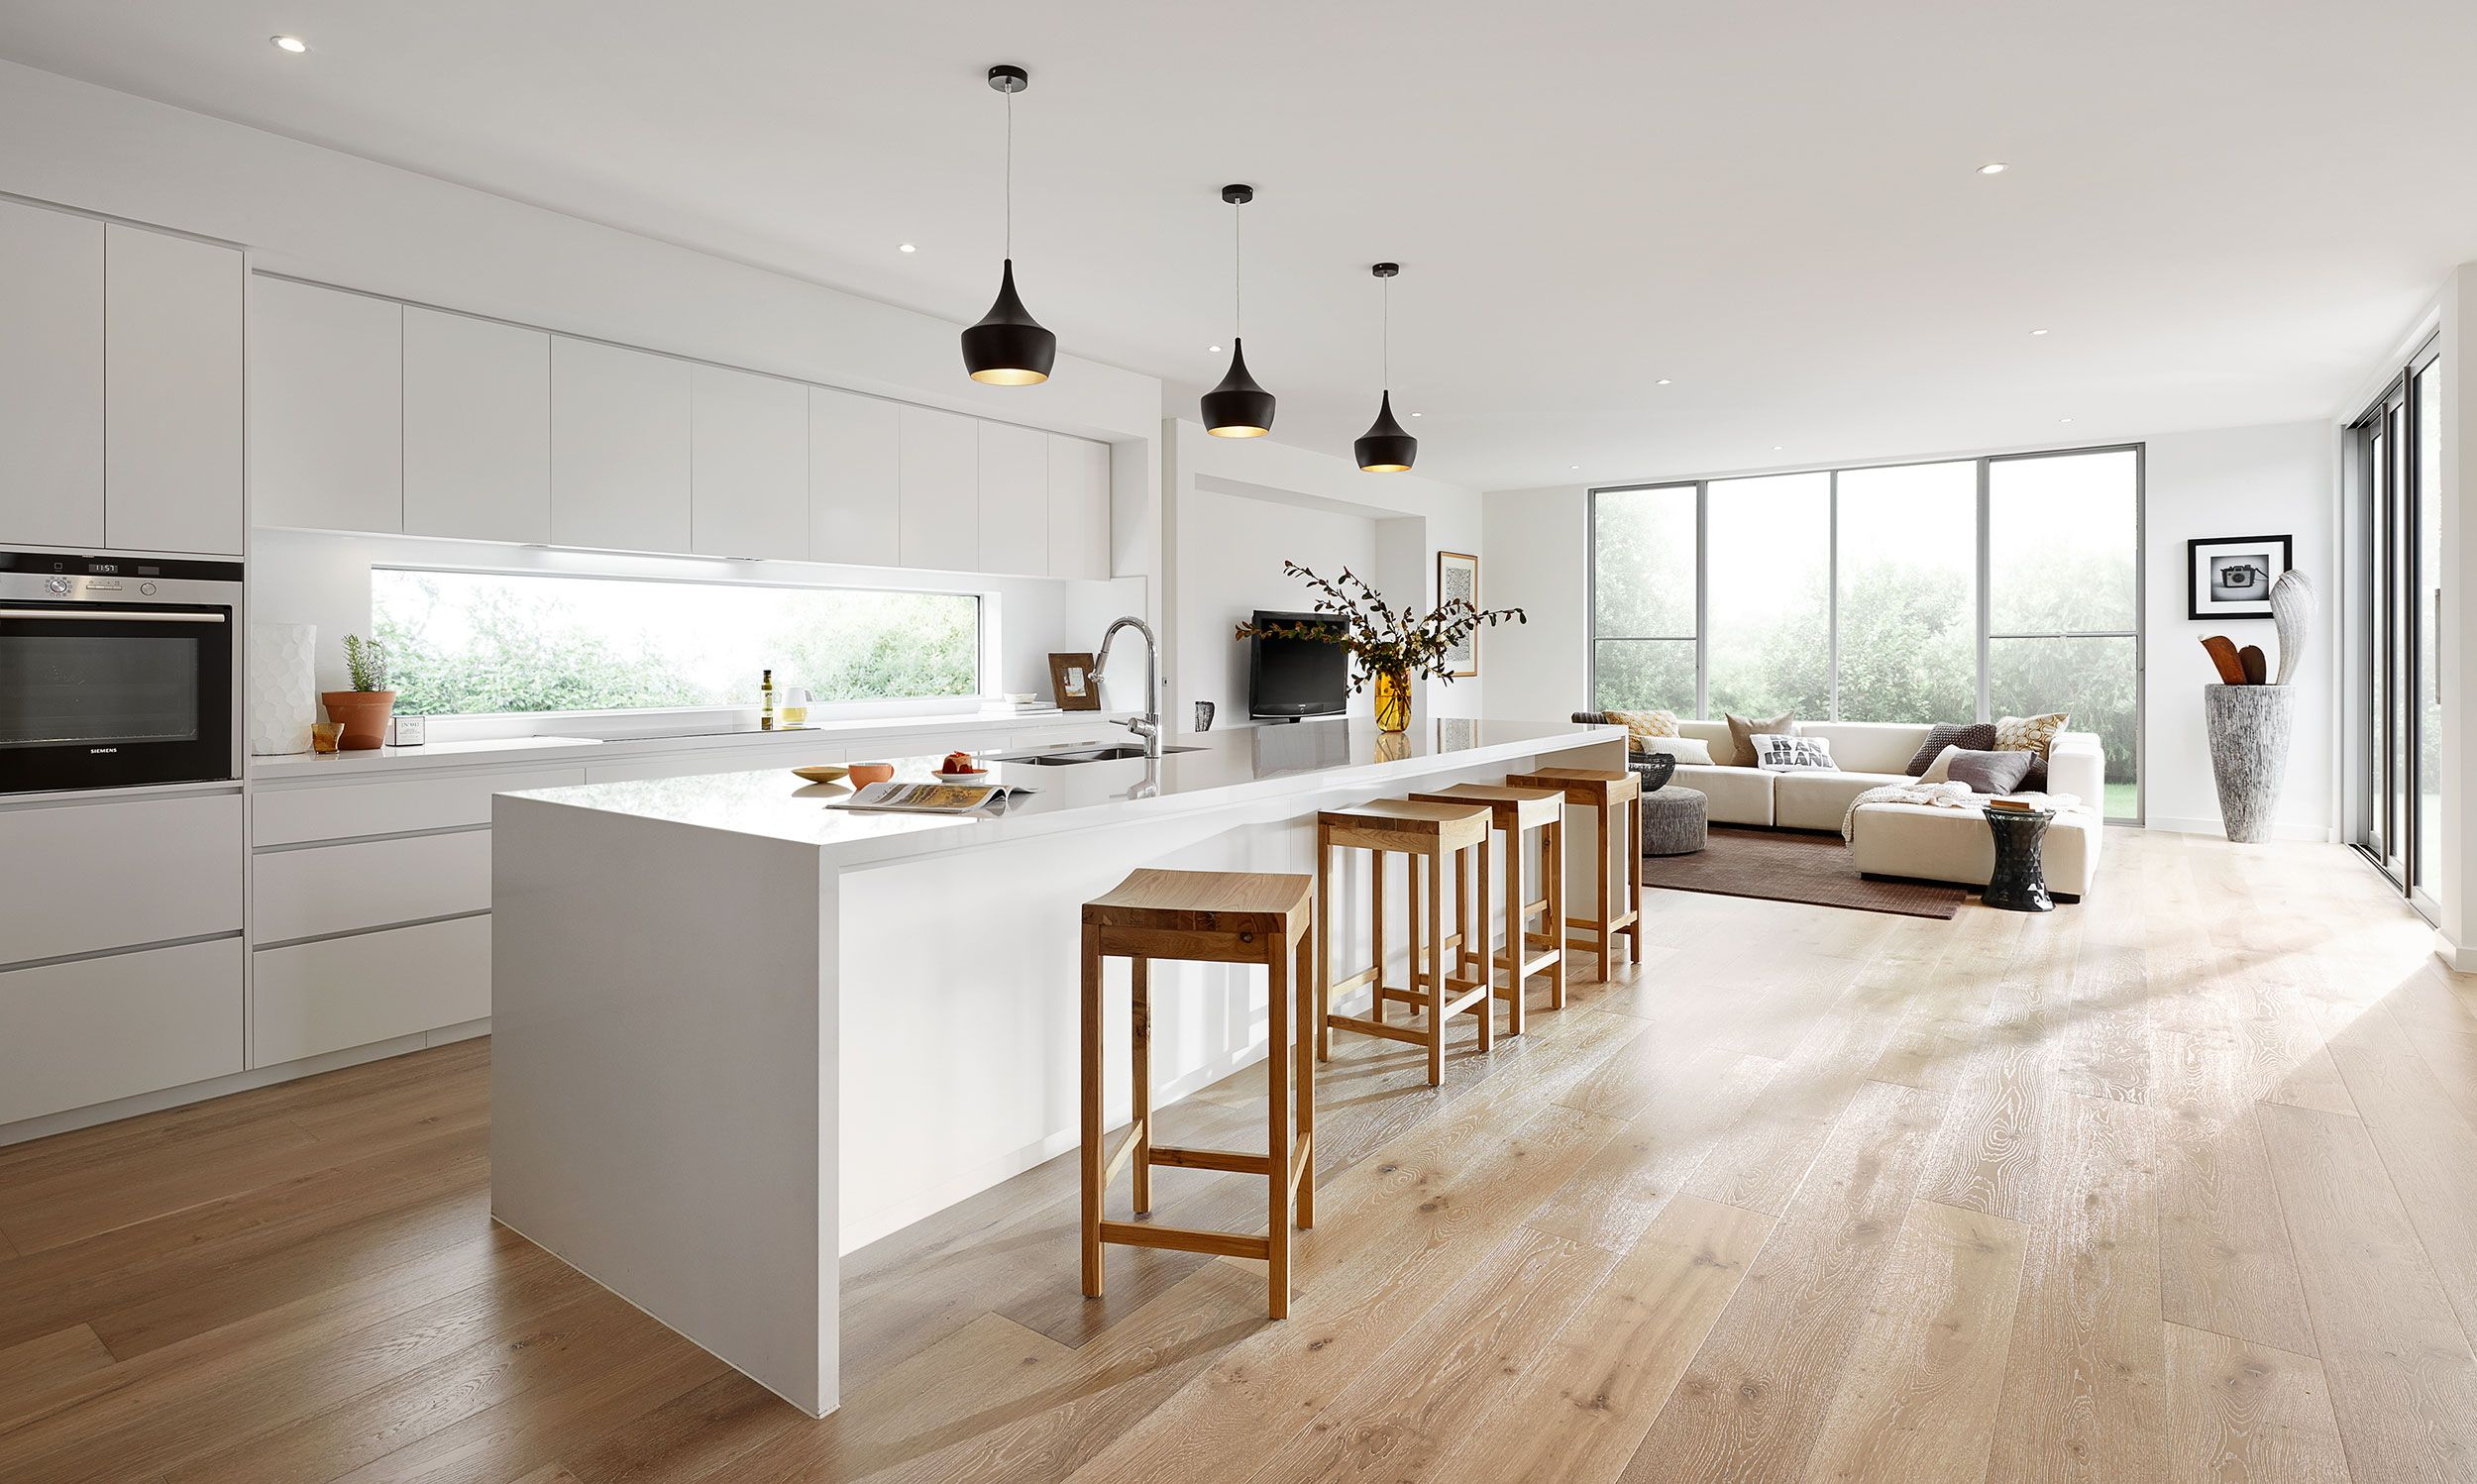 Caulfield 50 Kitchen And Family